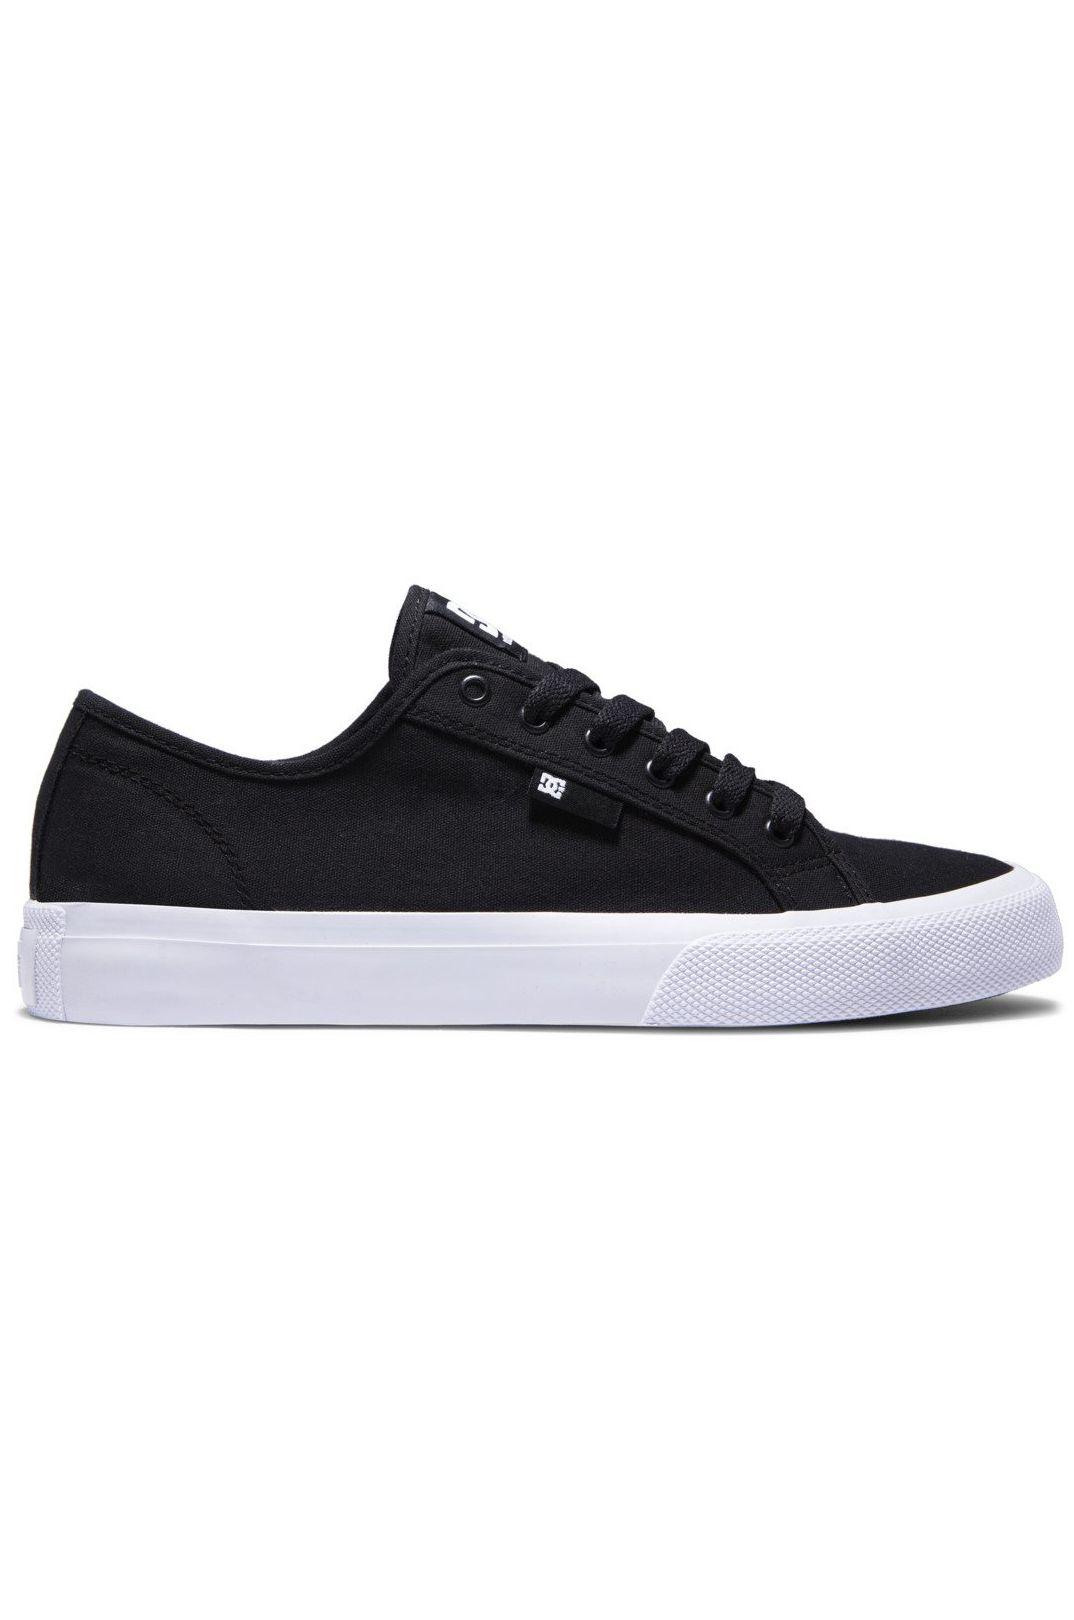 Tenis DC Shoes MANUAL Black/White